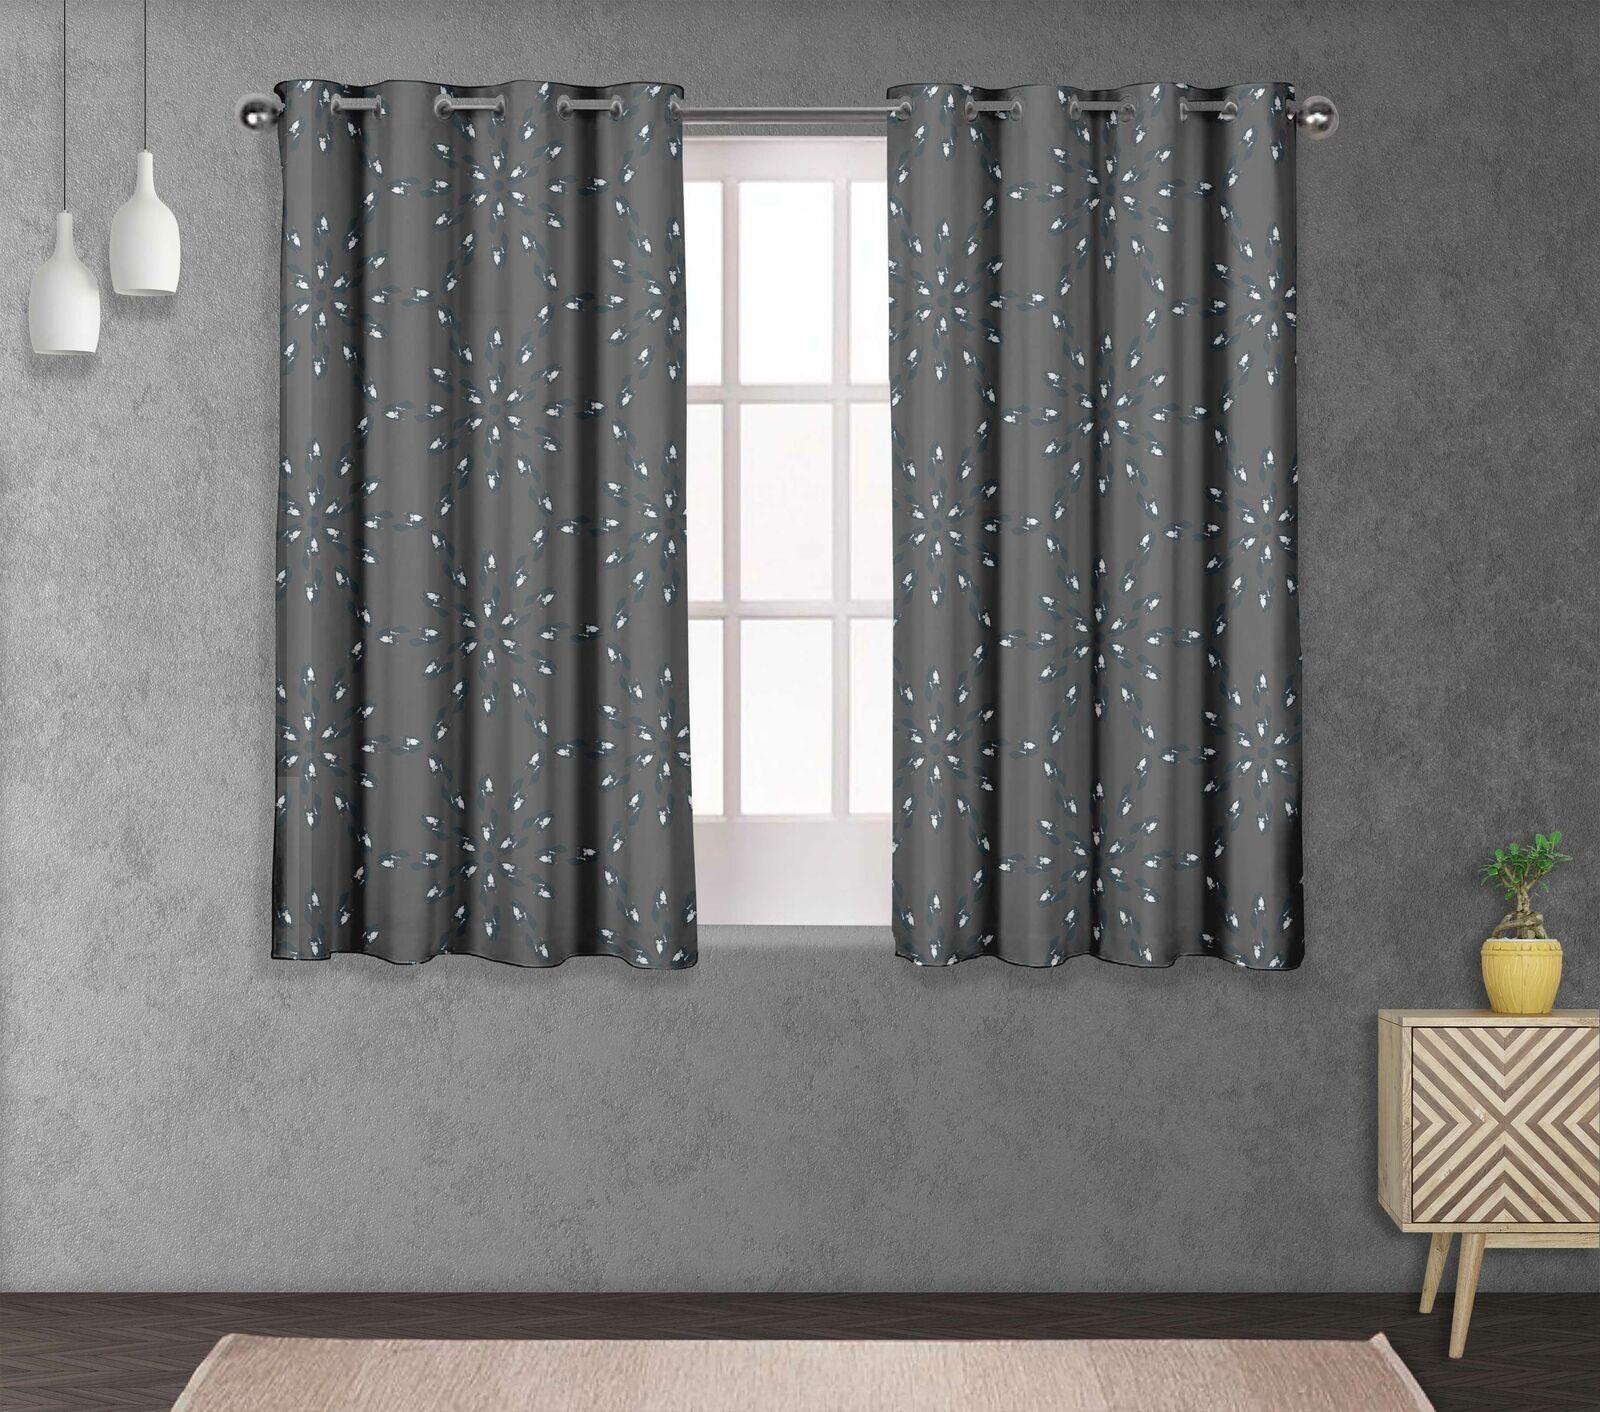 S4sassy Cat Living Room Eyelet Window short & long Curtain -AN-1E